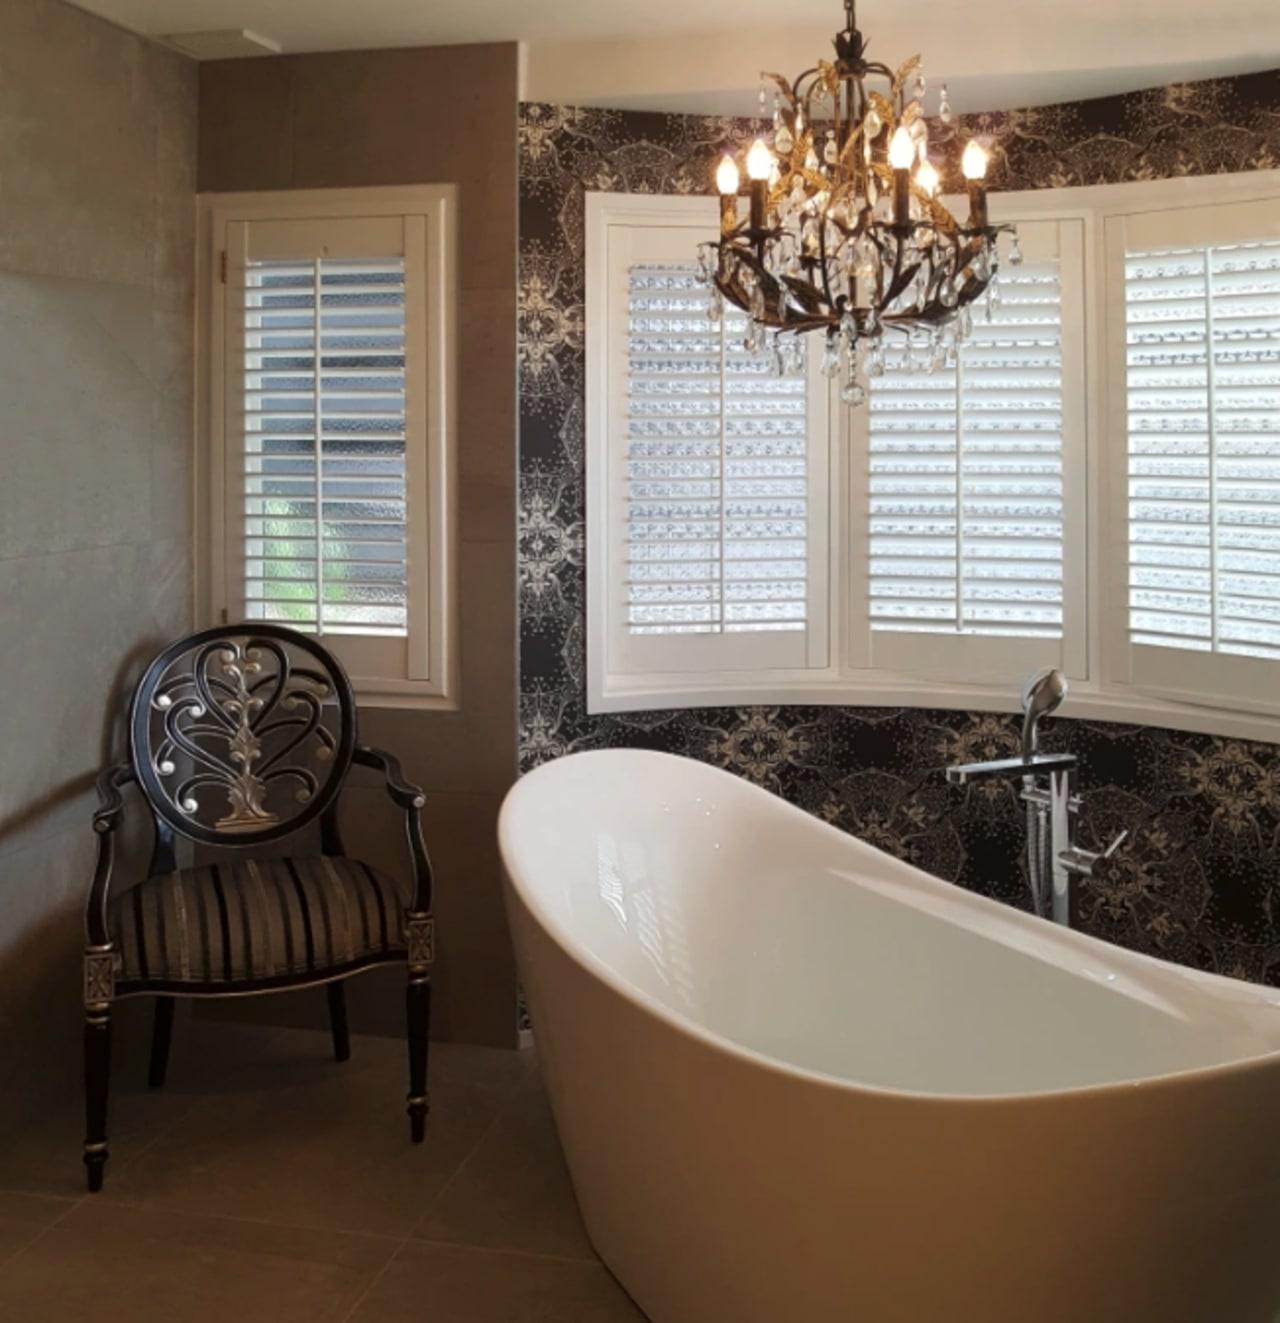 An elegant, functional custom-designed bathroom by Five bathroom, floor, flooring, home, interior design, plumbing fixture, room, sink, tile, wall, window, brown, gray